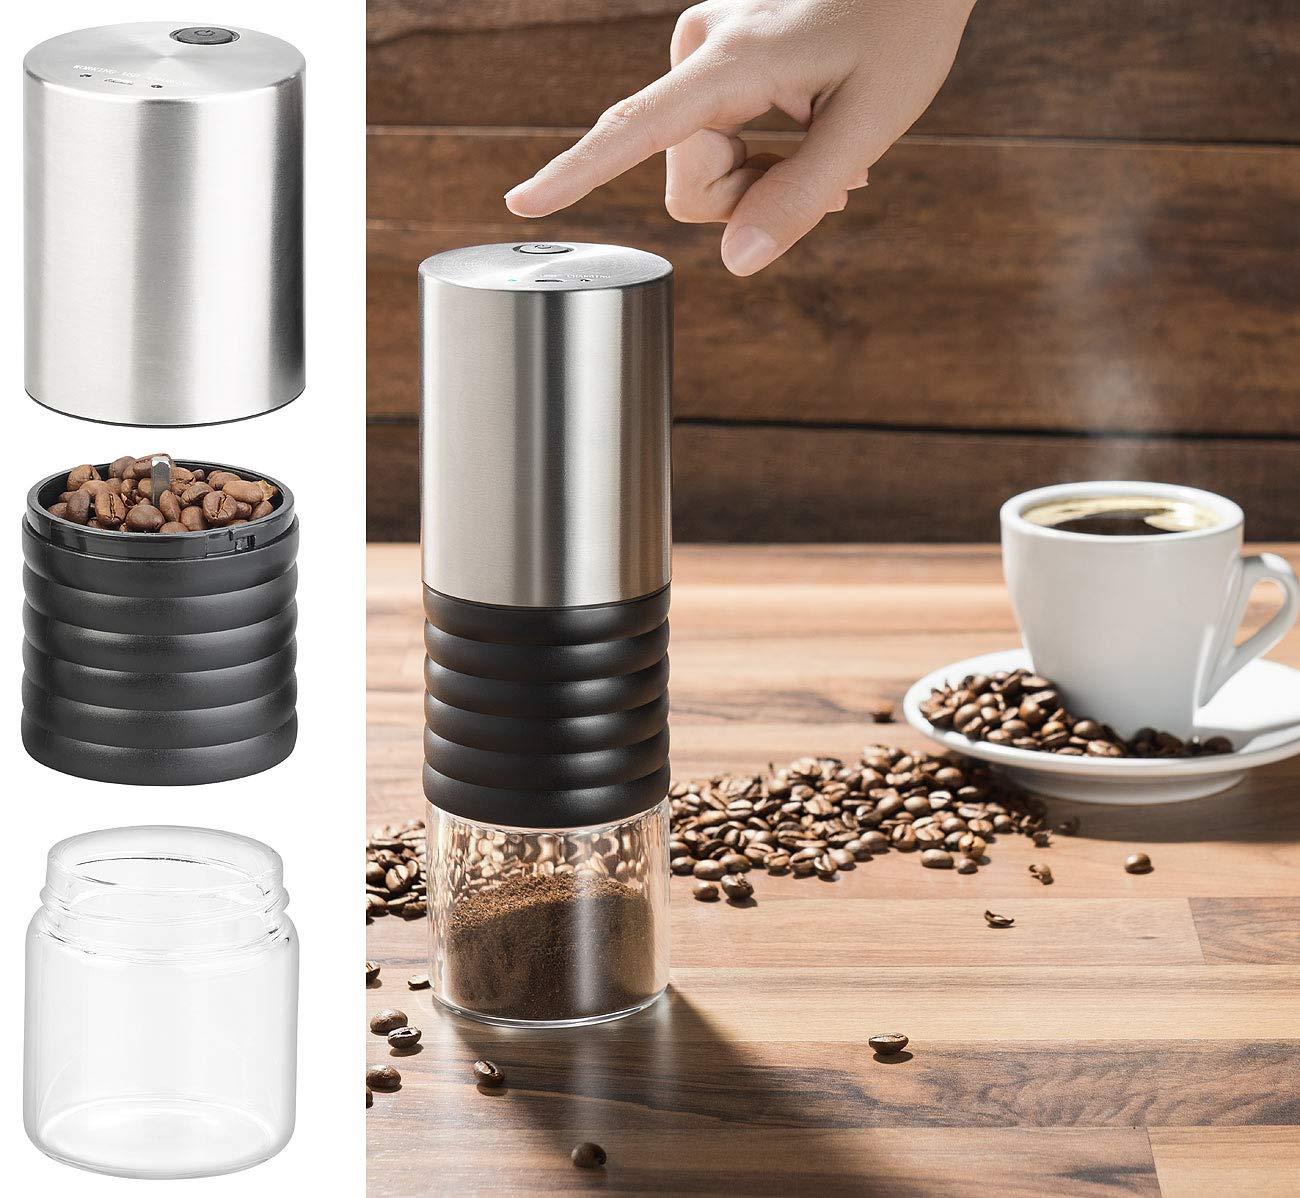 Rosenstein & Söhne 12V Kaffeemaschine: Elektrische Akku-Kaffeemühle mit Keramik-Mahlwerk, USB Ladebuchse (Mobile Kaffeemühle)